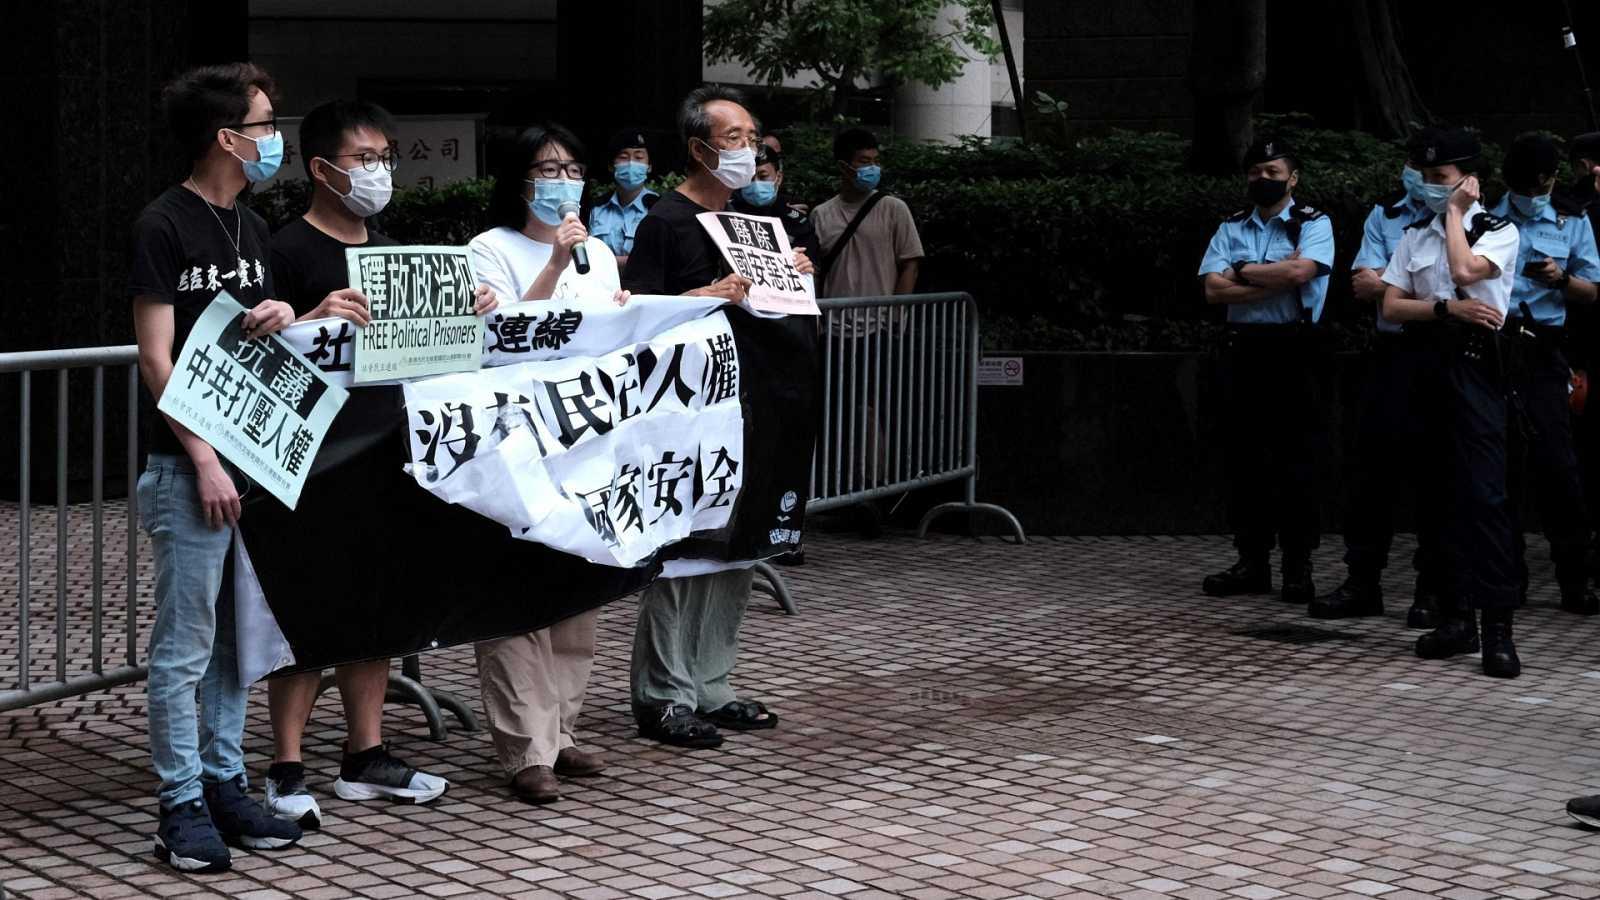 Reportajes 5 Continentes - China y el recorte de las libertades en Hong Kong - Escuchar ahora